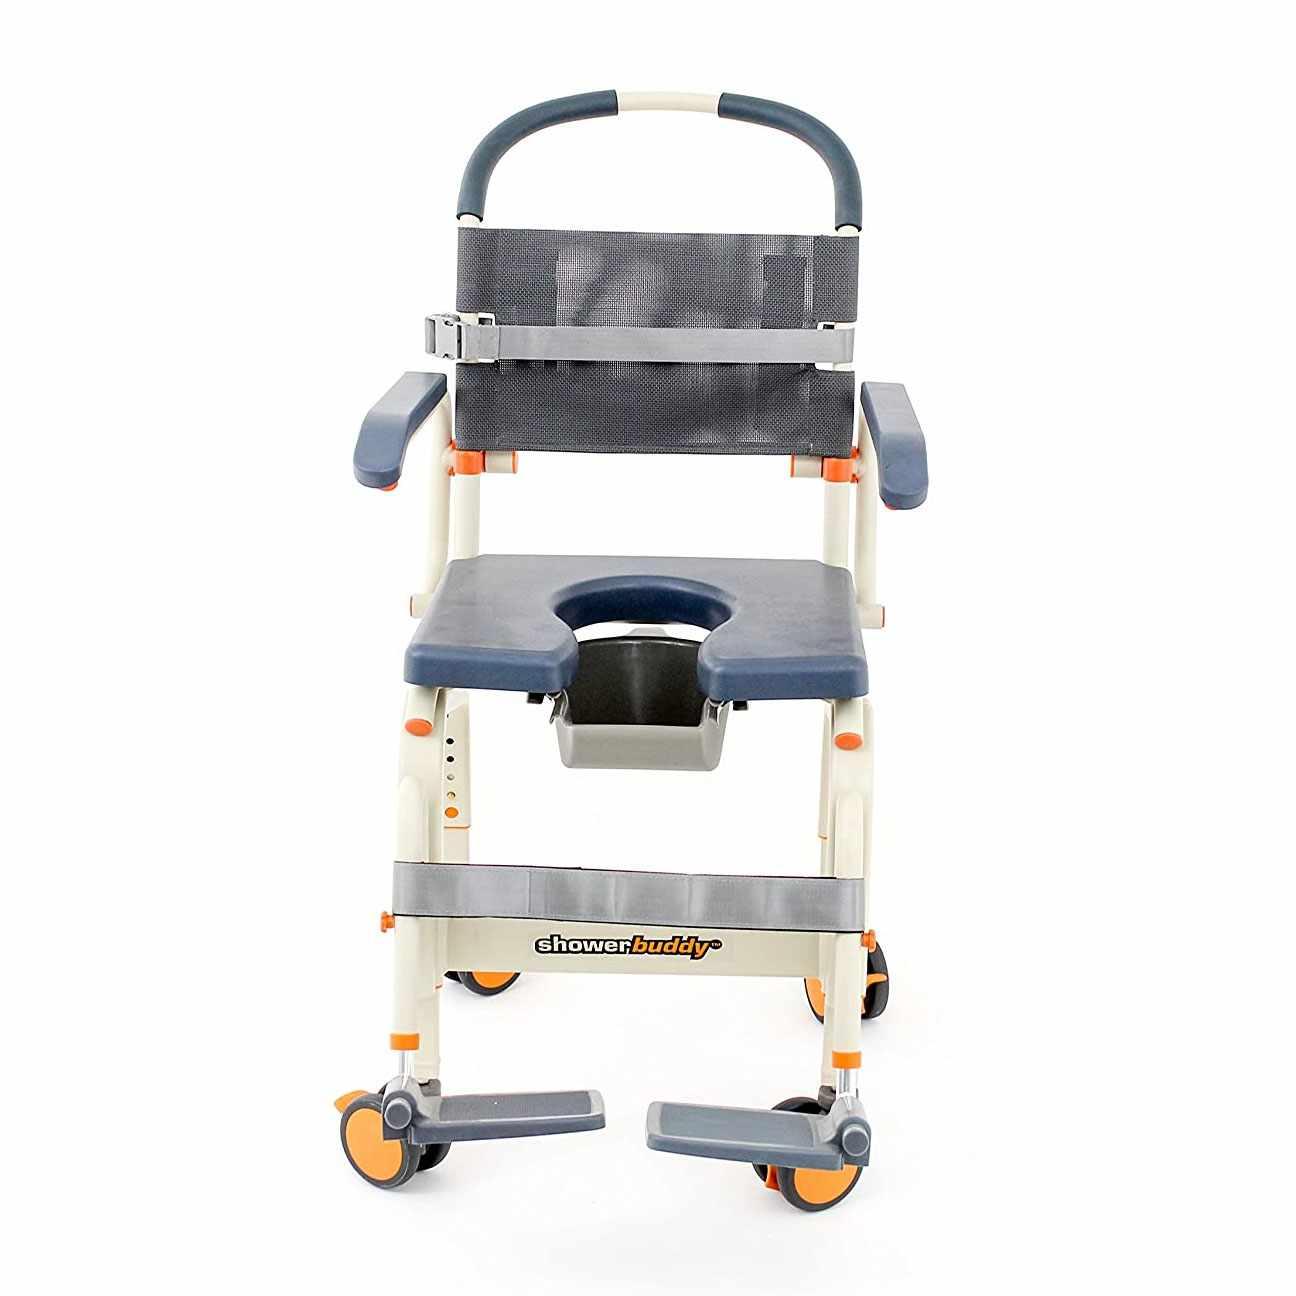 ShowerBuddy Shower Commode Chair | Showerbuddy Roll-Inbuddy Lite